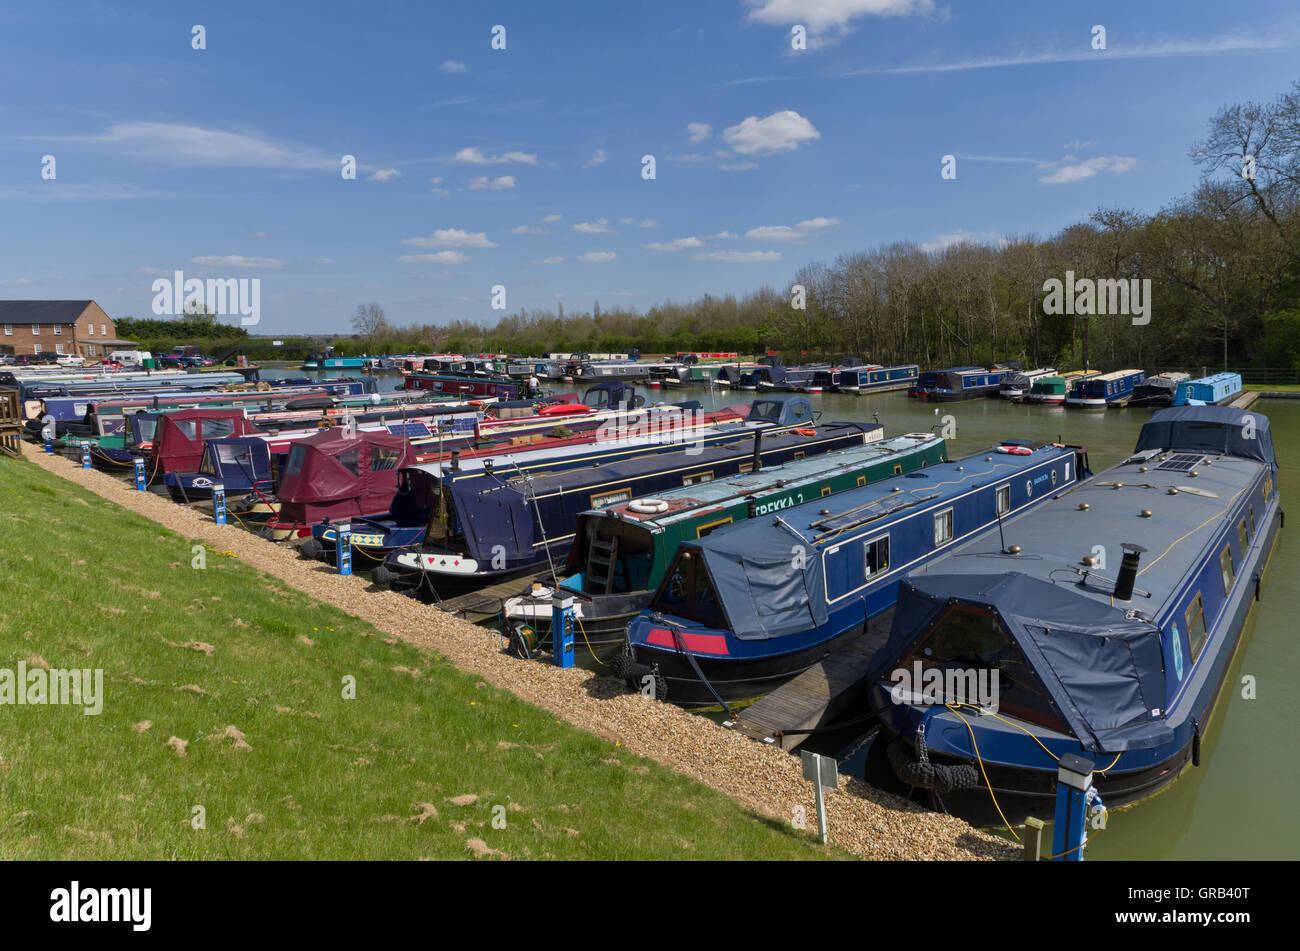 Lines of narrowboats moored at Blisworth Marina, Northamptonshire, UK - Stock Image